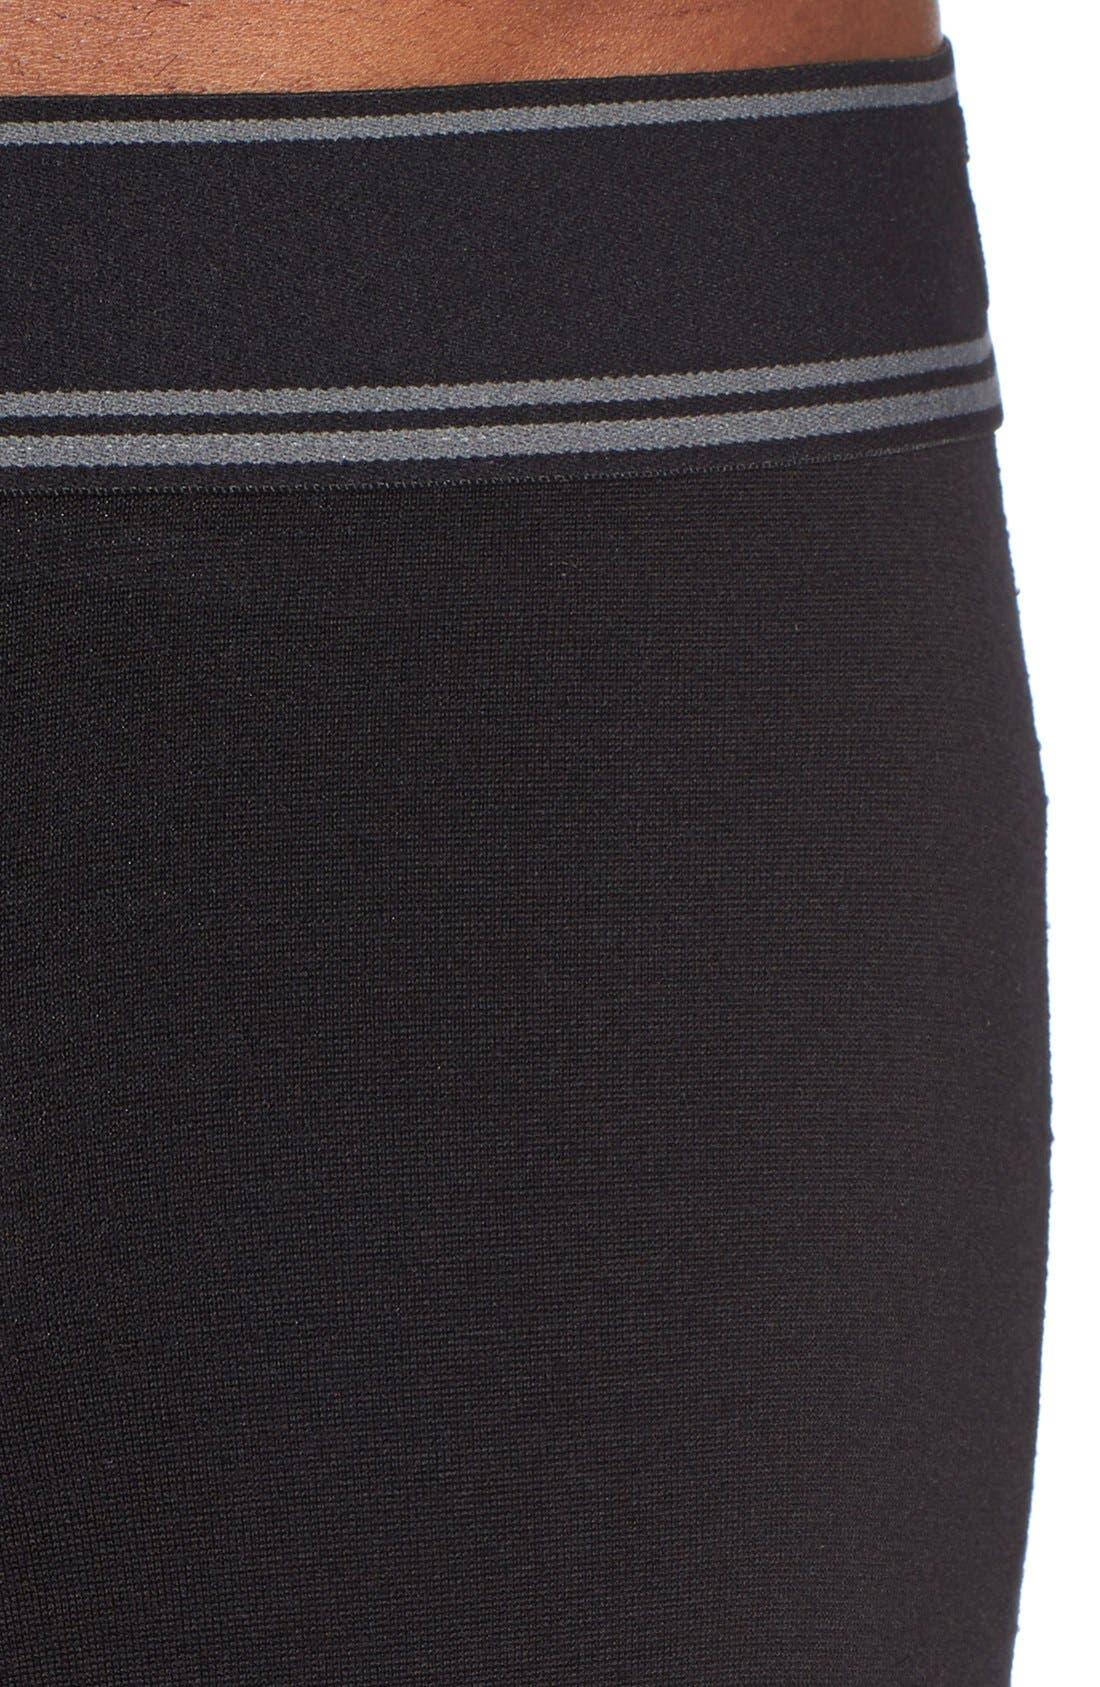 SAXX,                             'Black Sheep' Moisture Wicking Long Underwear,                             Alternate thumbnail 4, color,                             019